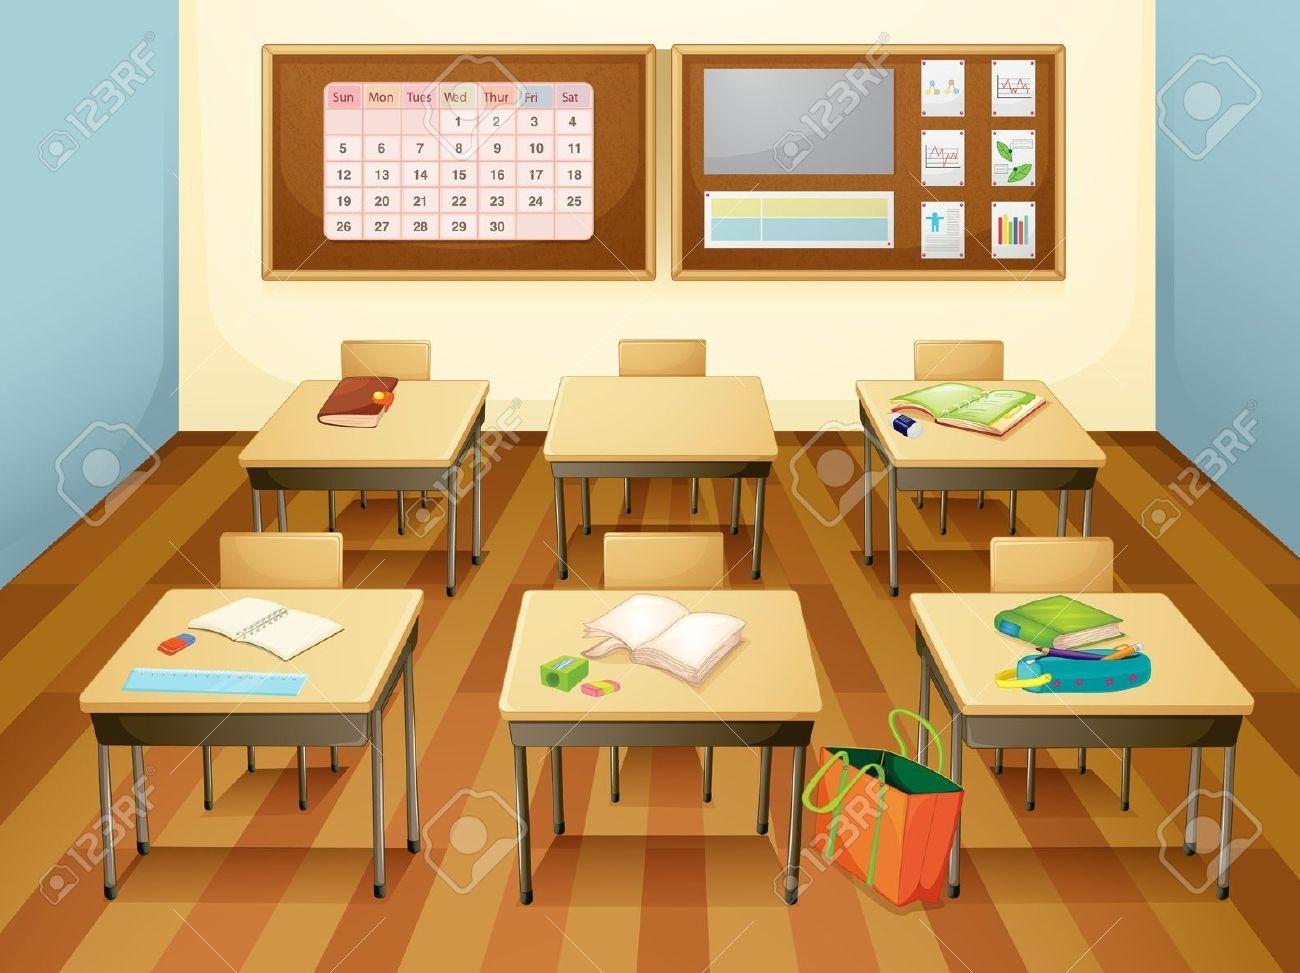 classroom clipart gallery - Classroomclipart